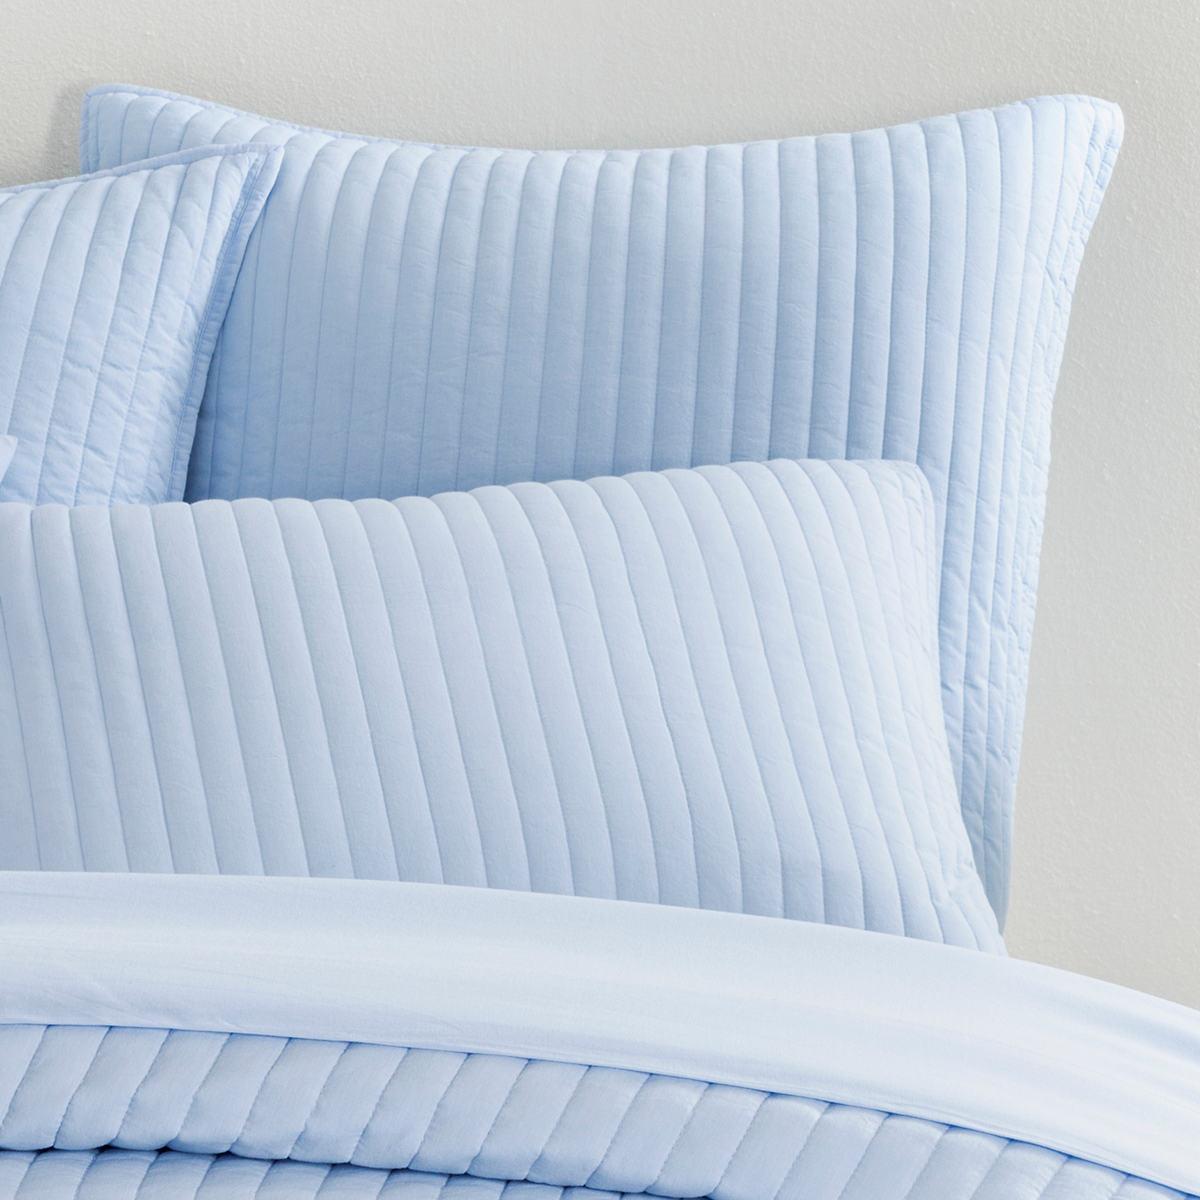 Comfy Cotton Soft Blue Quilted Sham